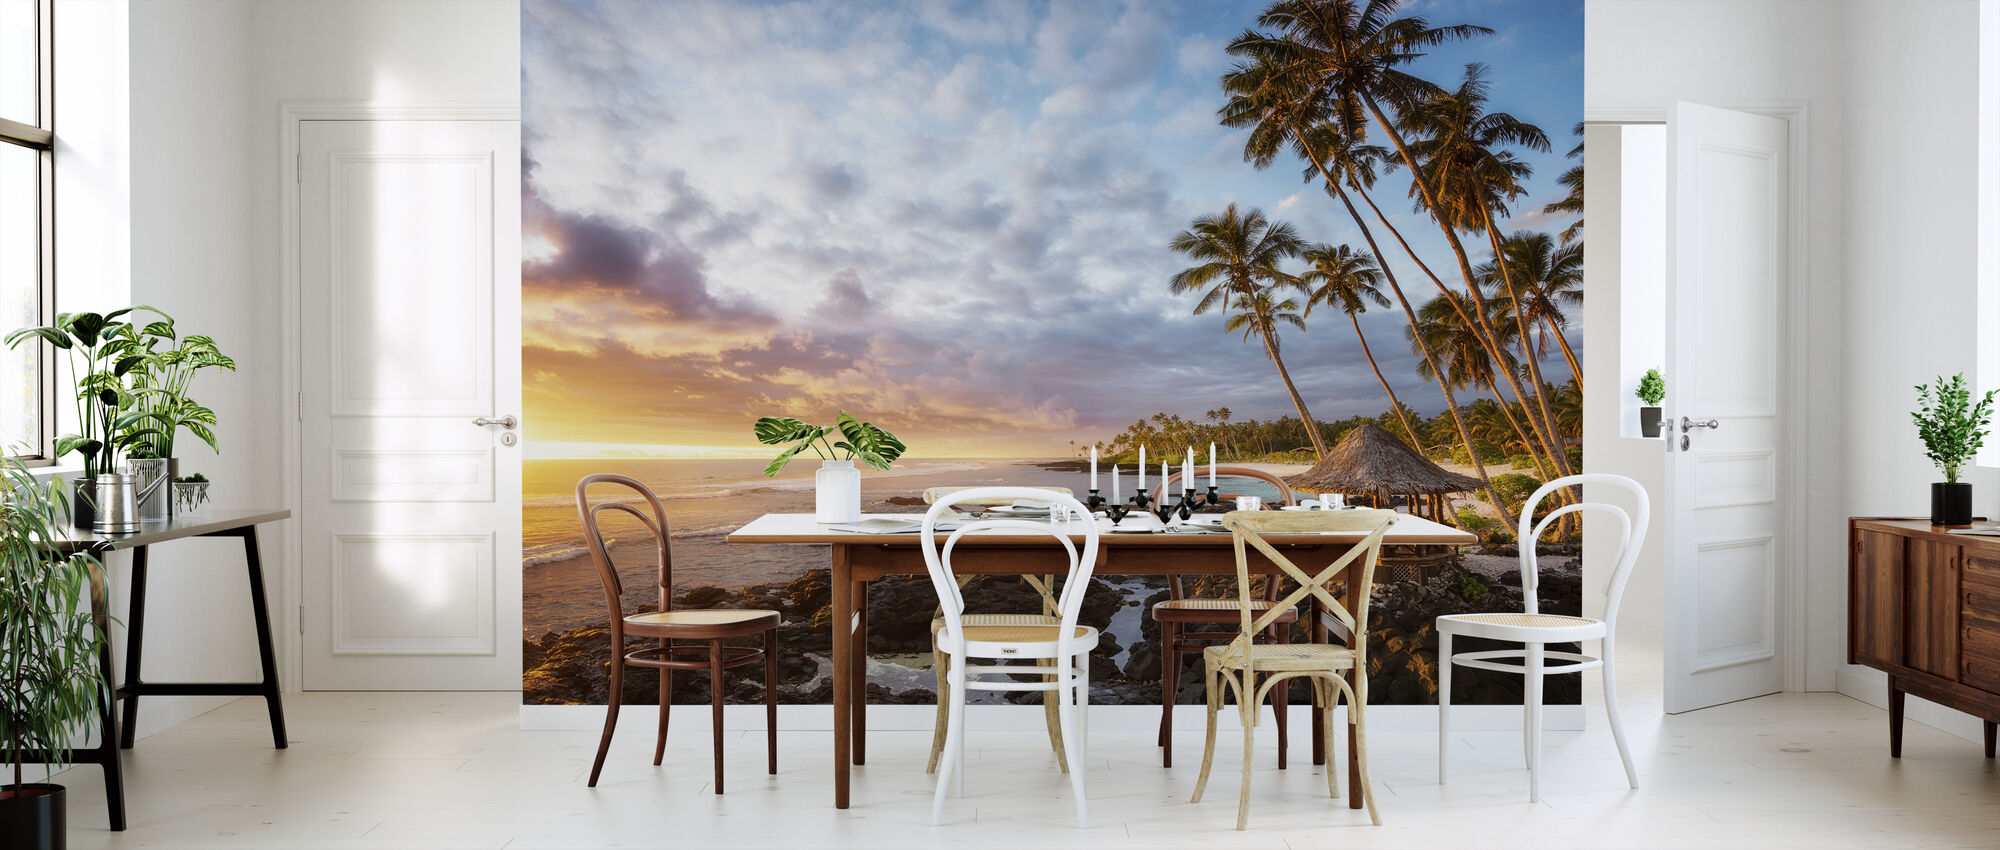 Return to Paradise - Wallpaper - Kitchen